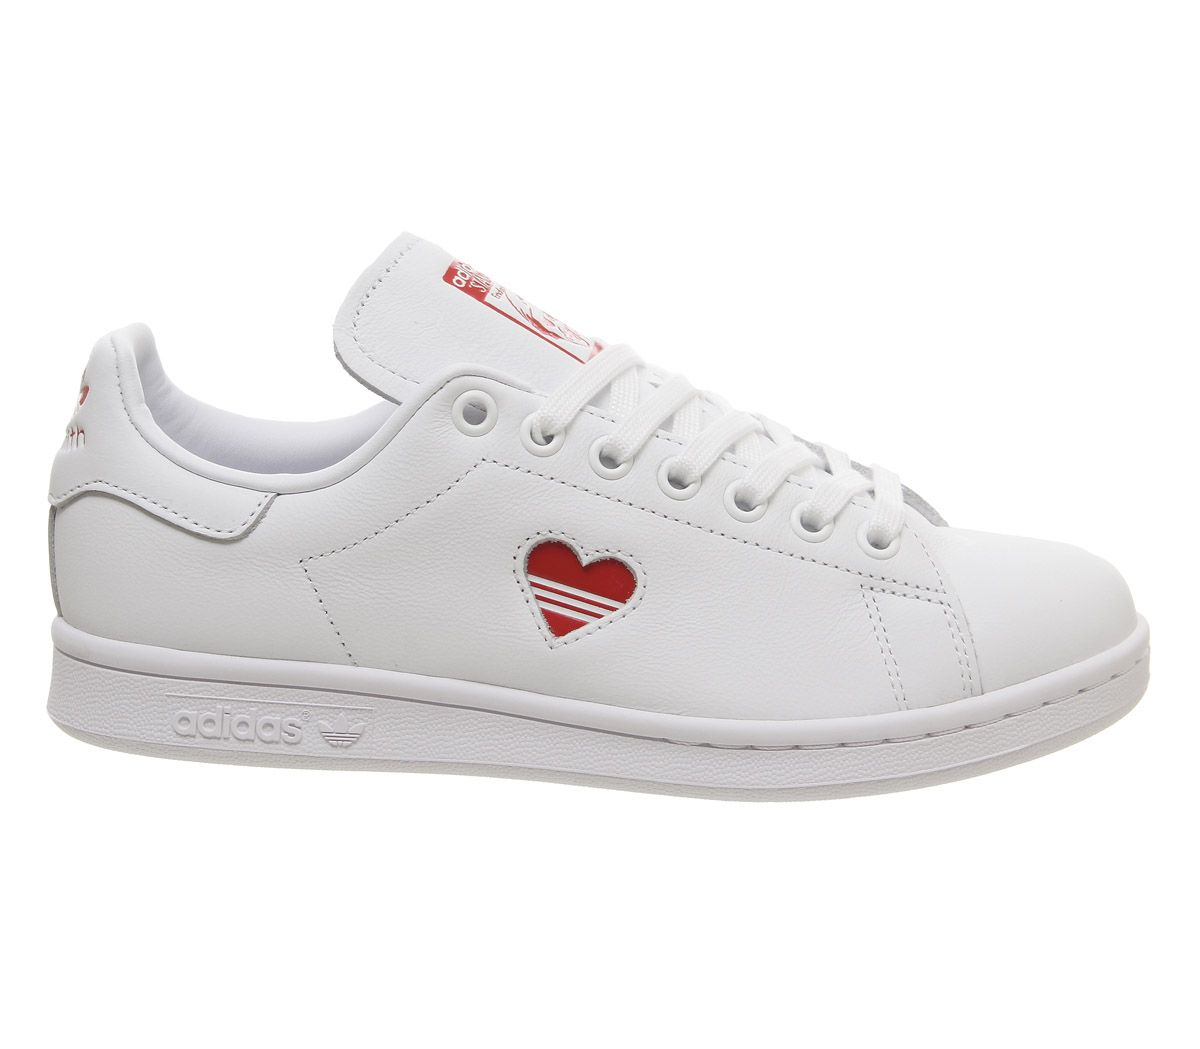 e971336b2 Mujer Adidas Stan Smith Zapatillas Blancas Corazón Rojo Zapatillas ...